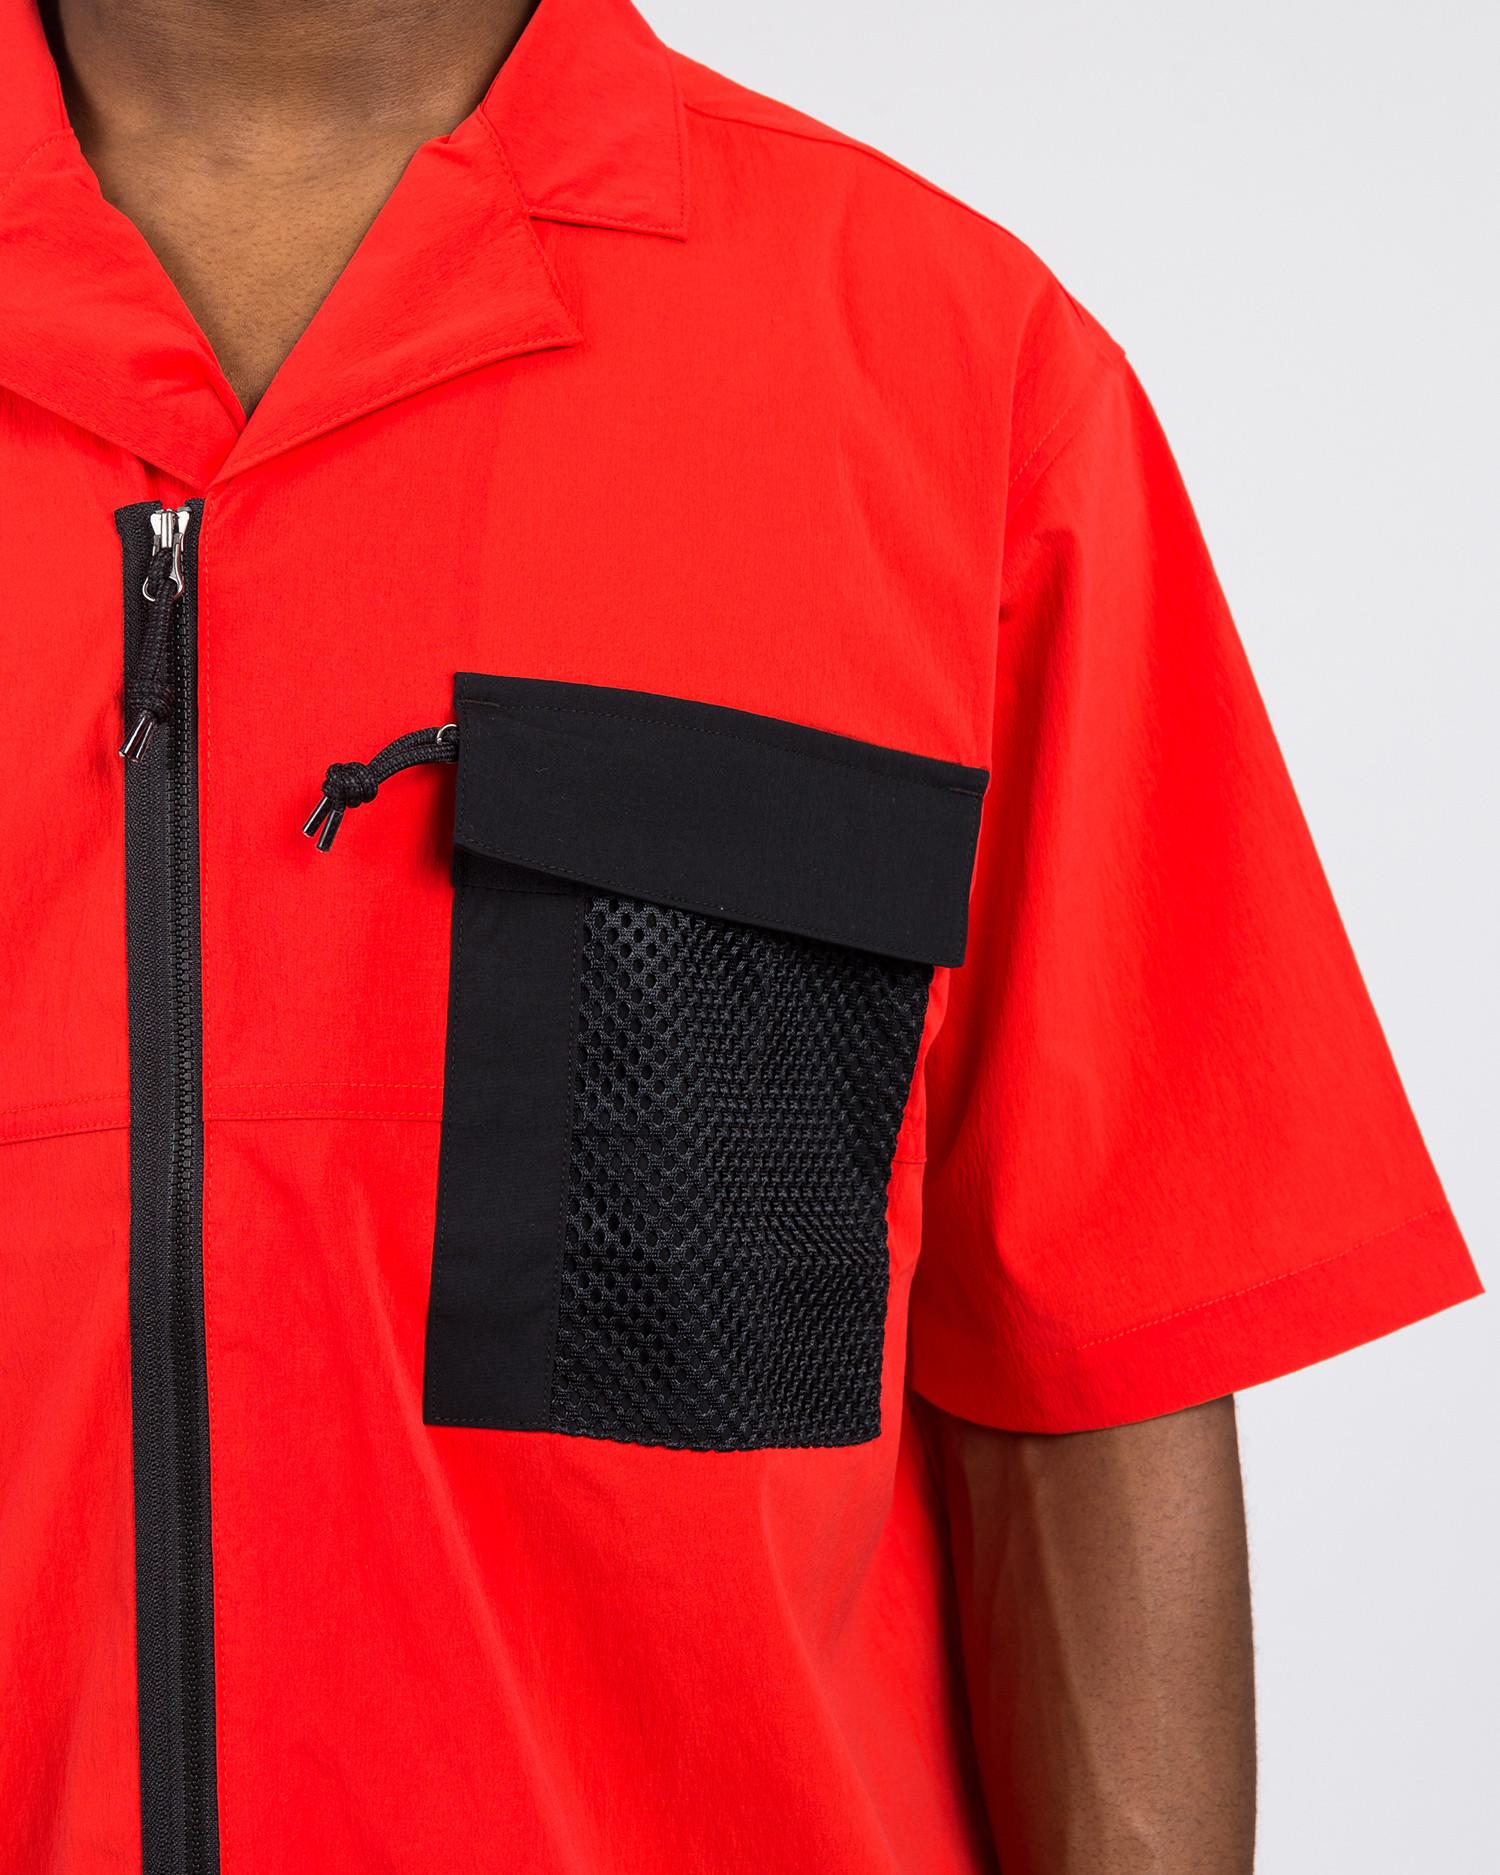 Nike ACG NRG Top Habanero Red/Black